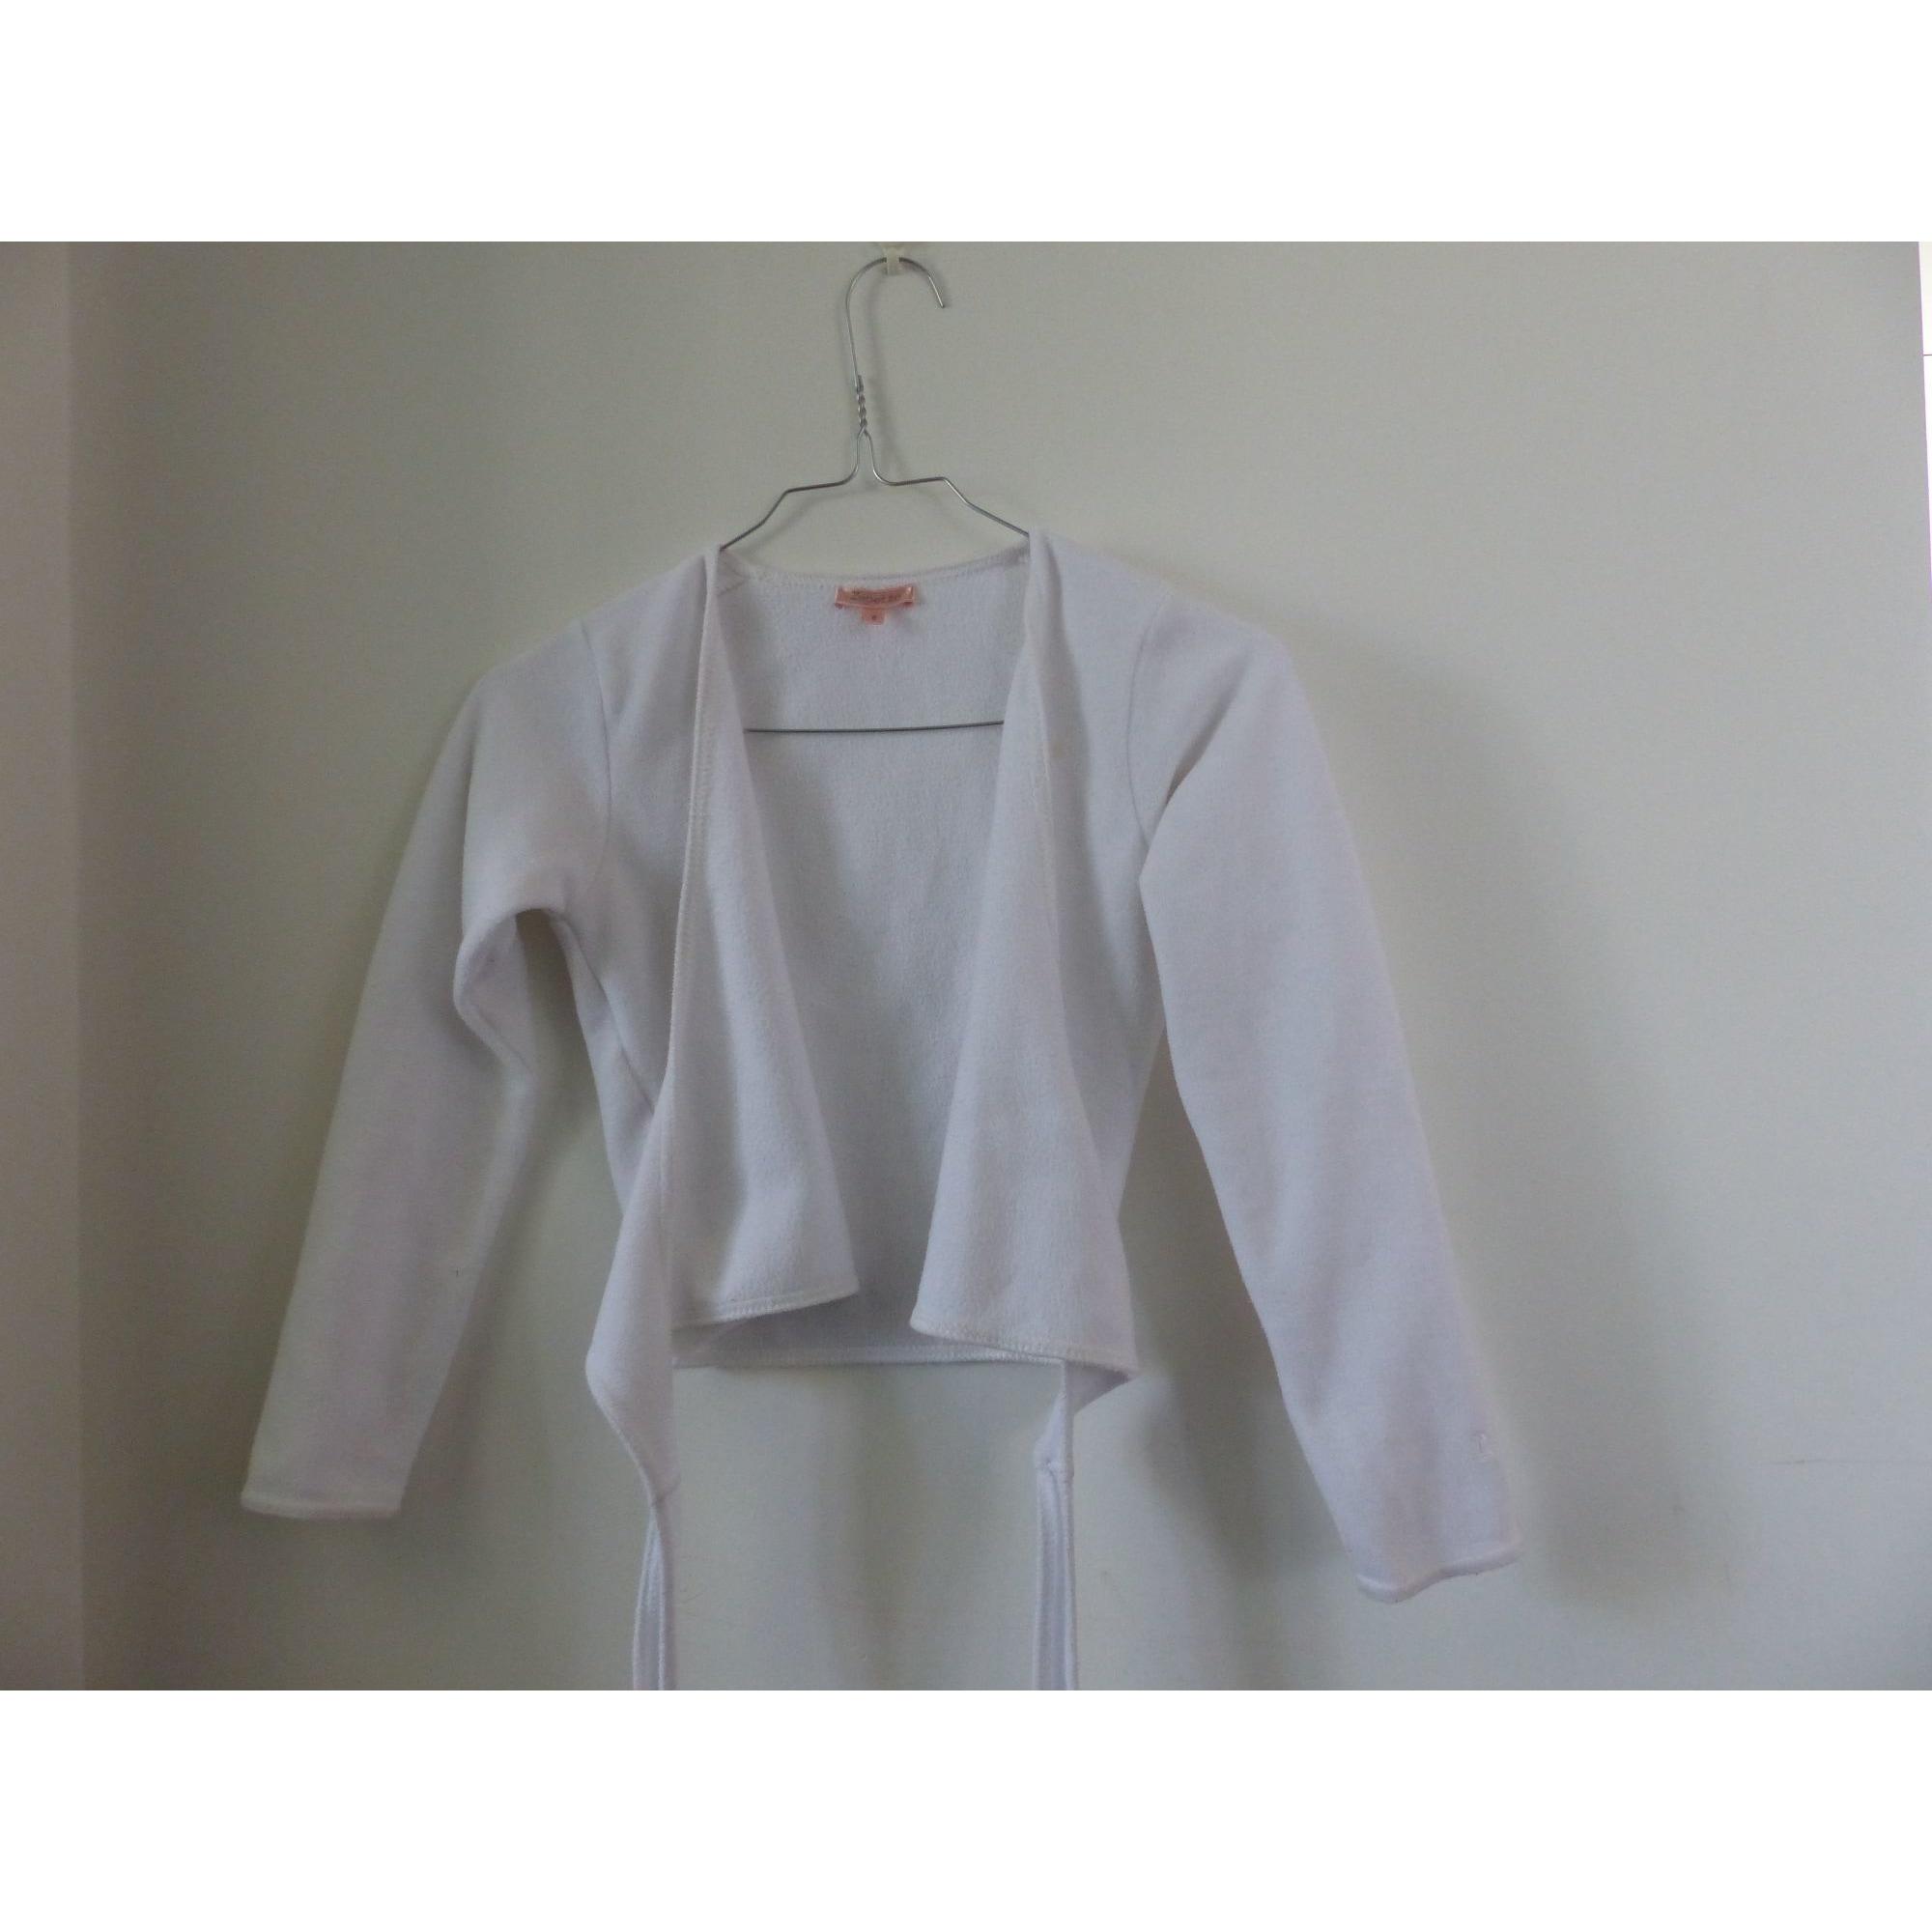 Top, Tee-shirt REPETTO Blanc, blanc cassé, écru